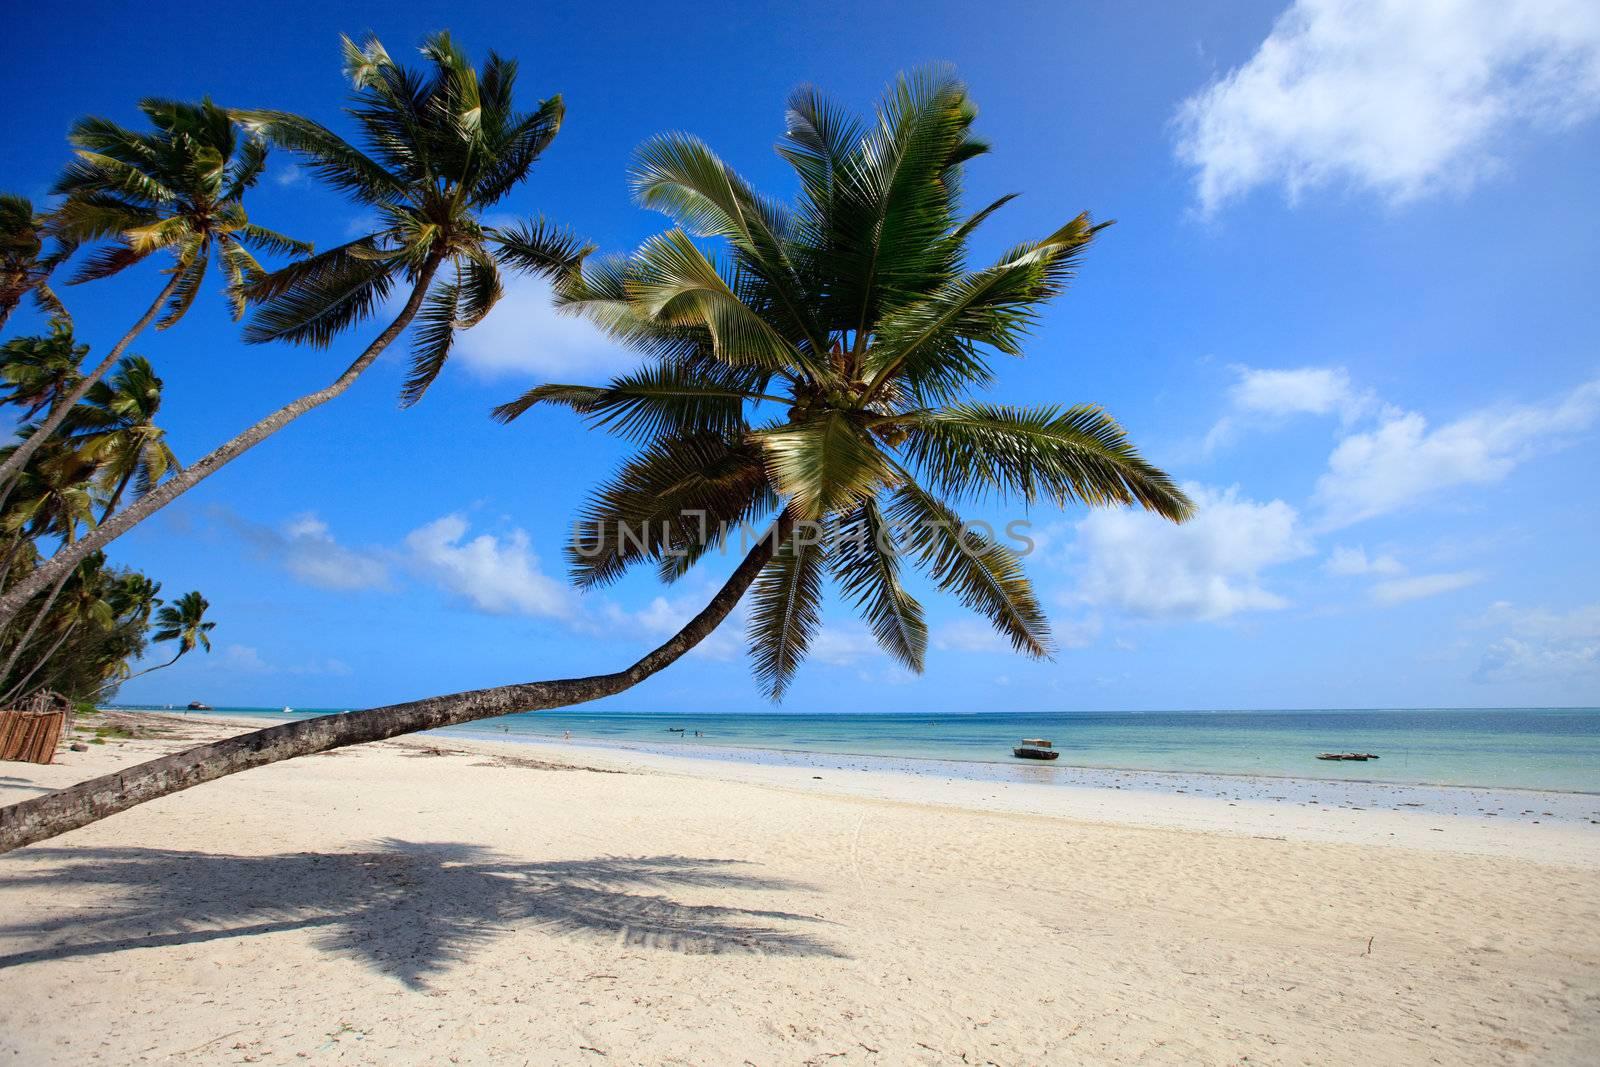 White sand tropical beach with palm trees on north-west coast of Zanzibar island